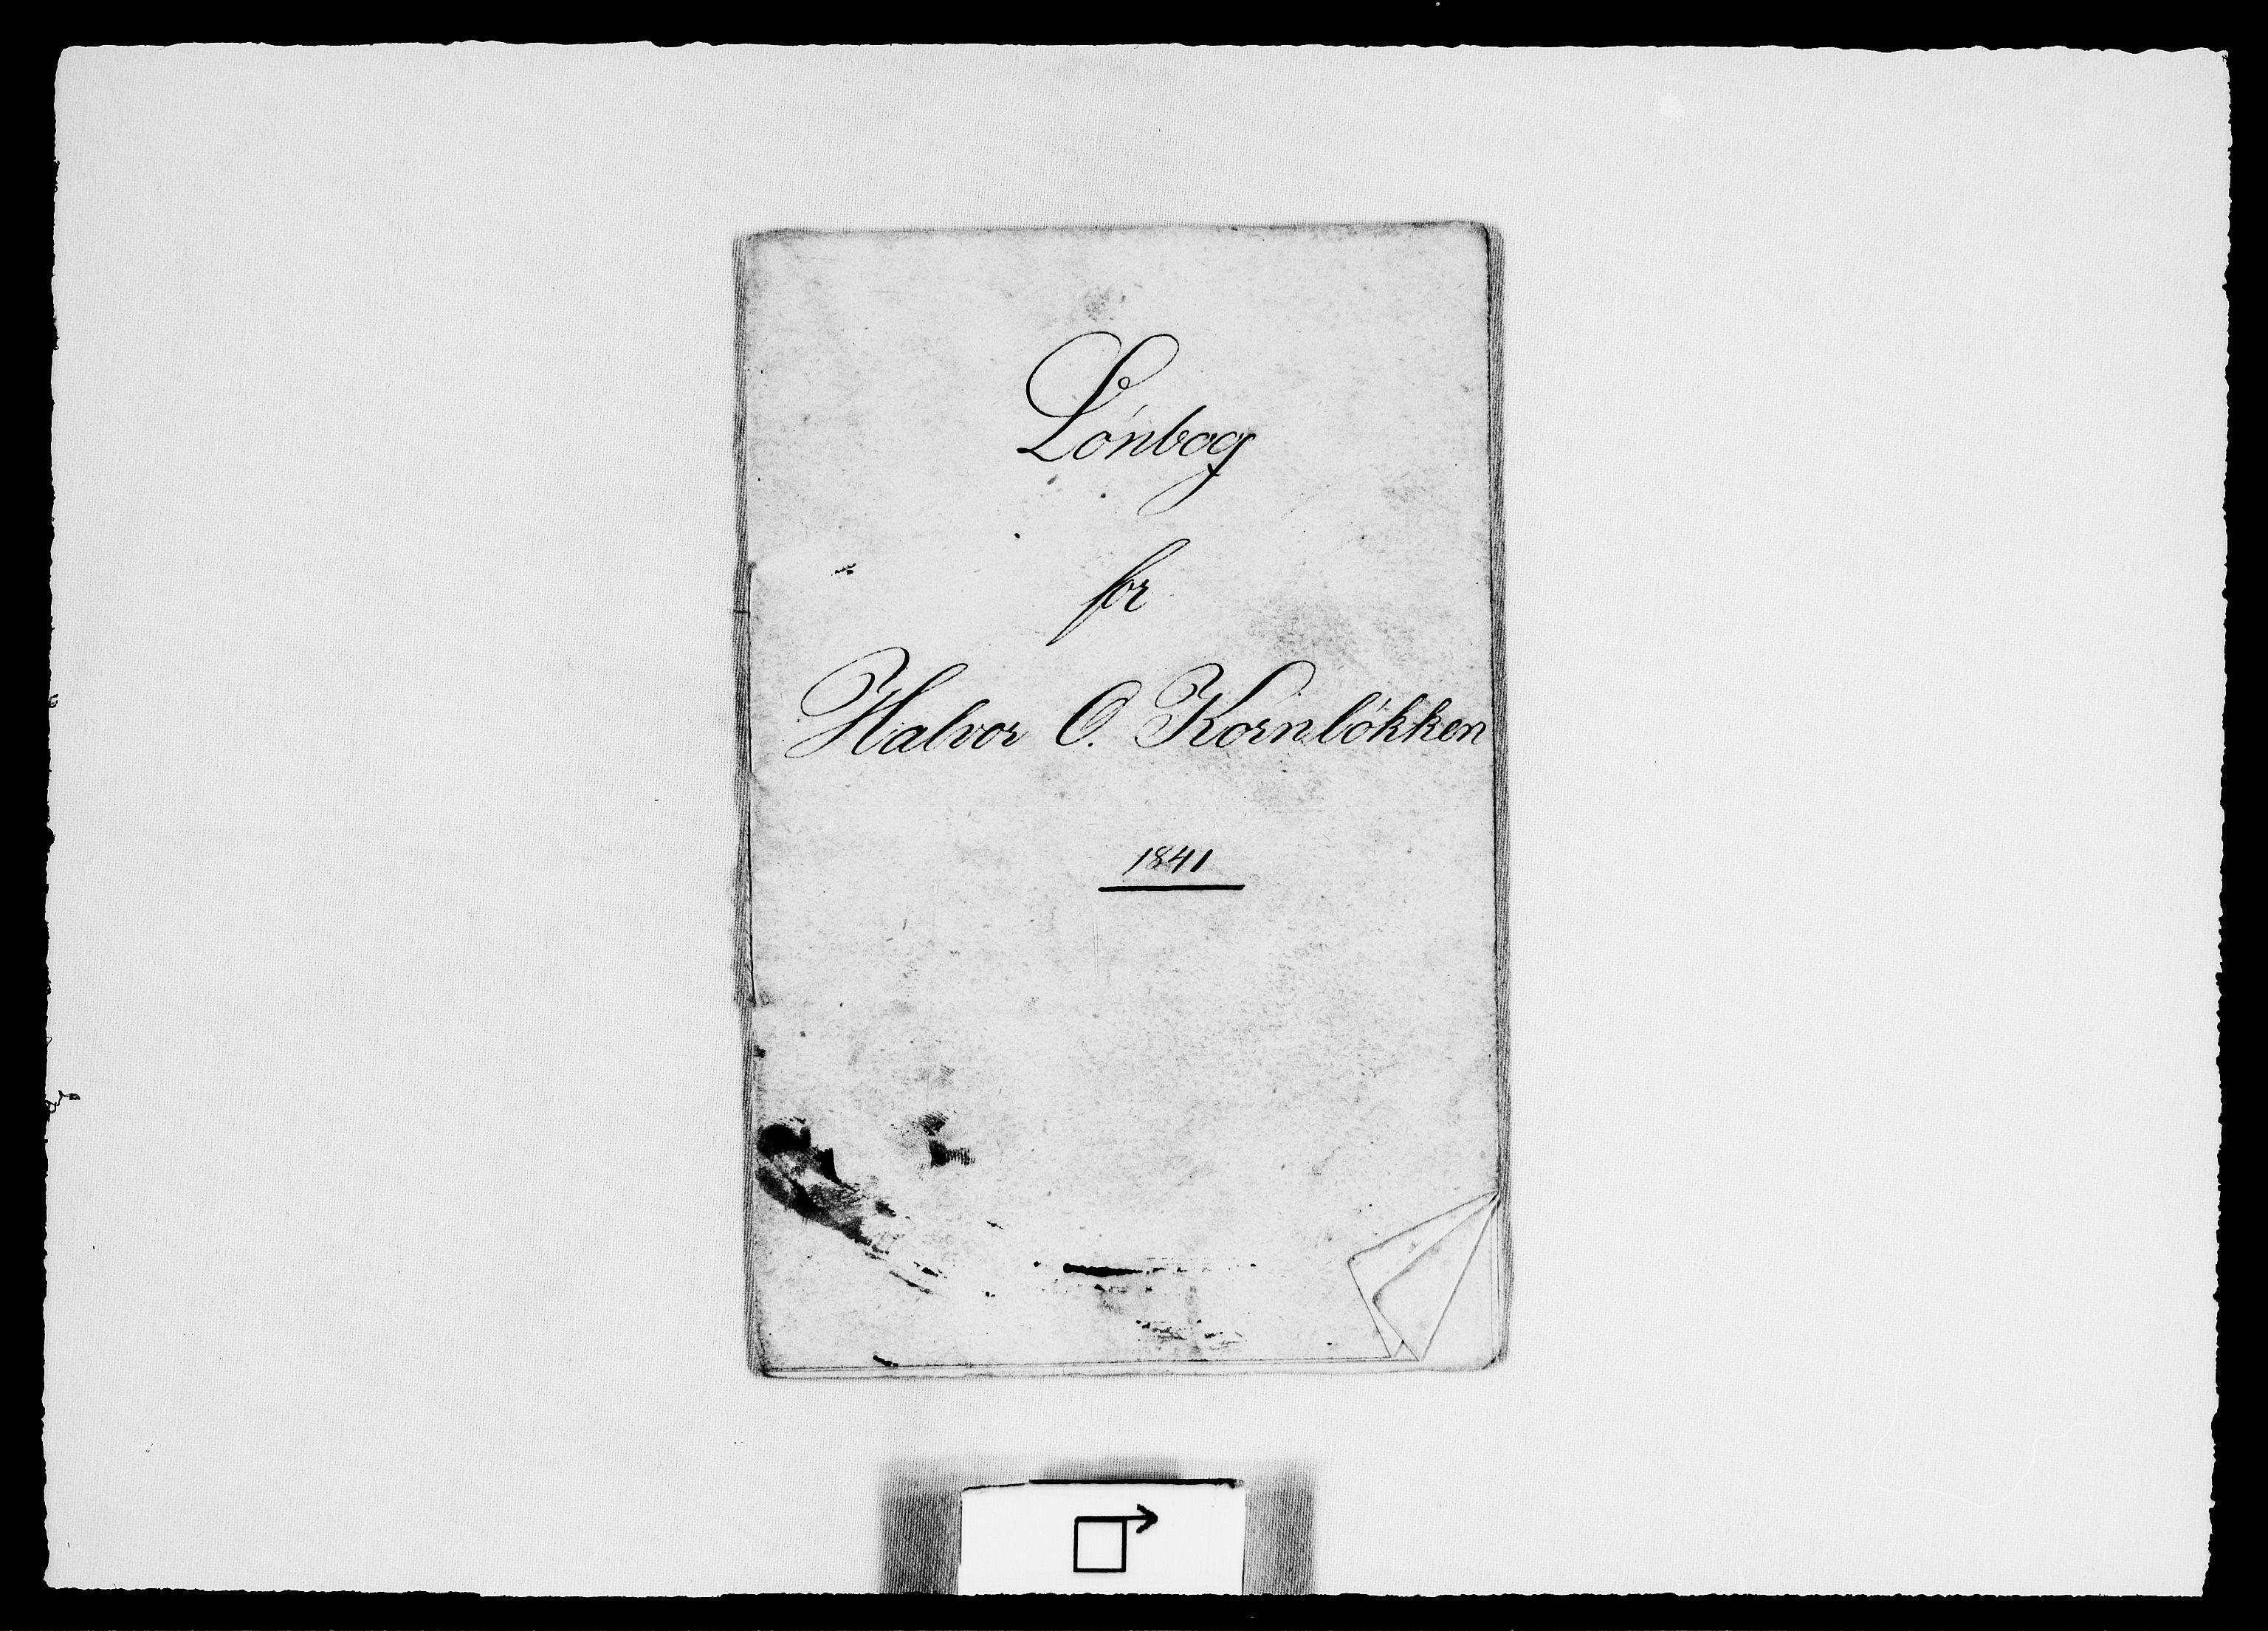 RA, Modums Blaafarveværk, G/Gd/Gdd/L0299, 1842-1844, s. 2